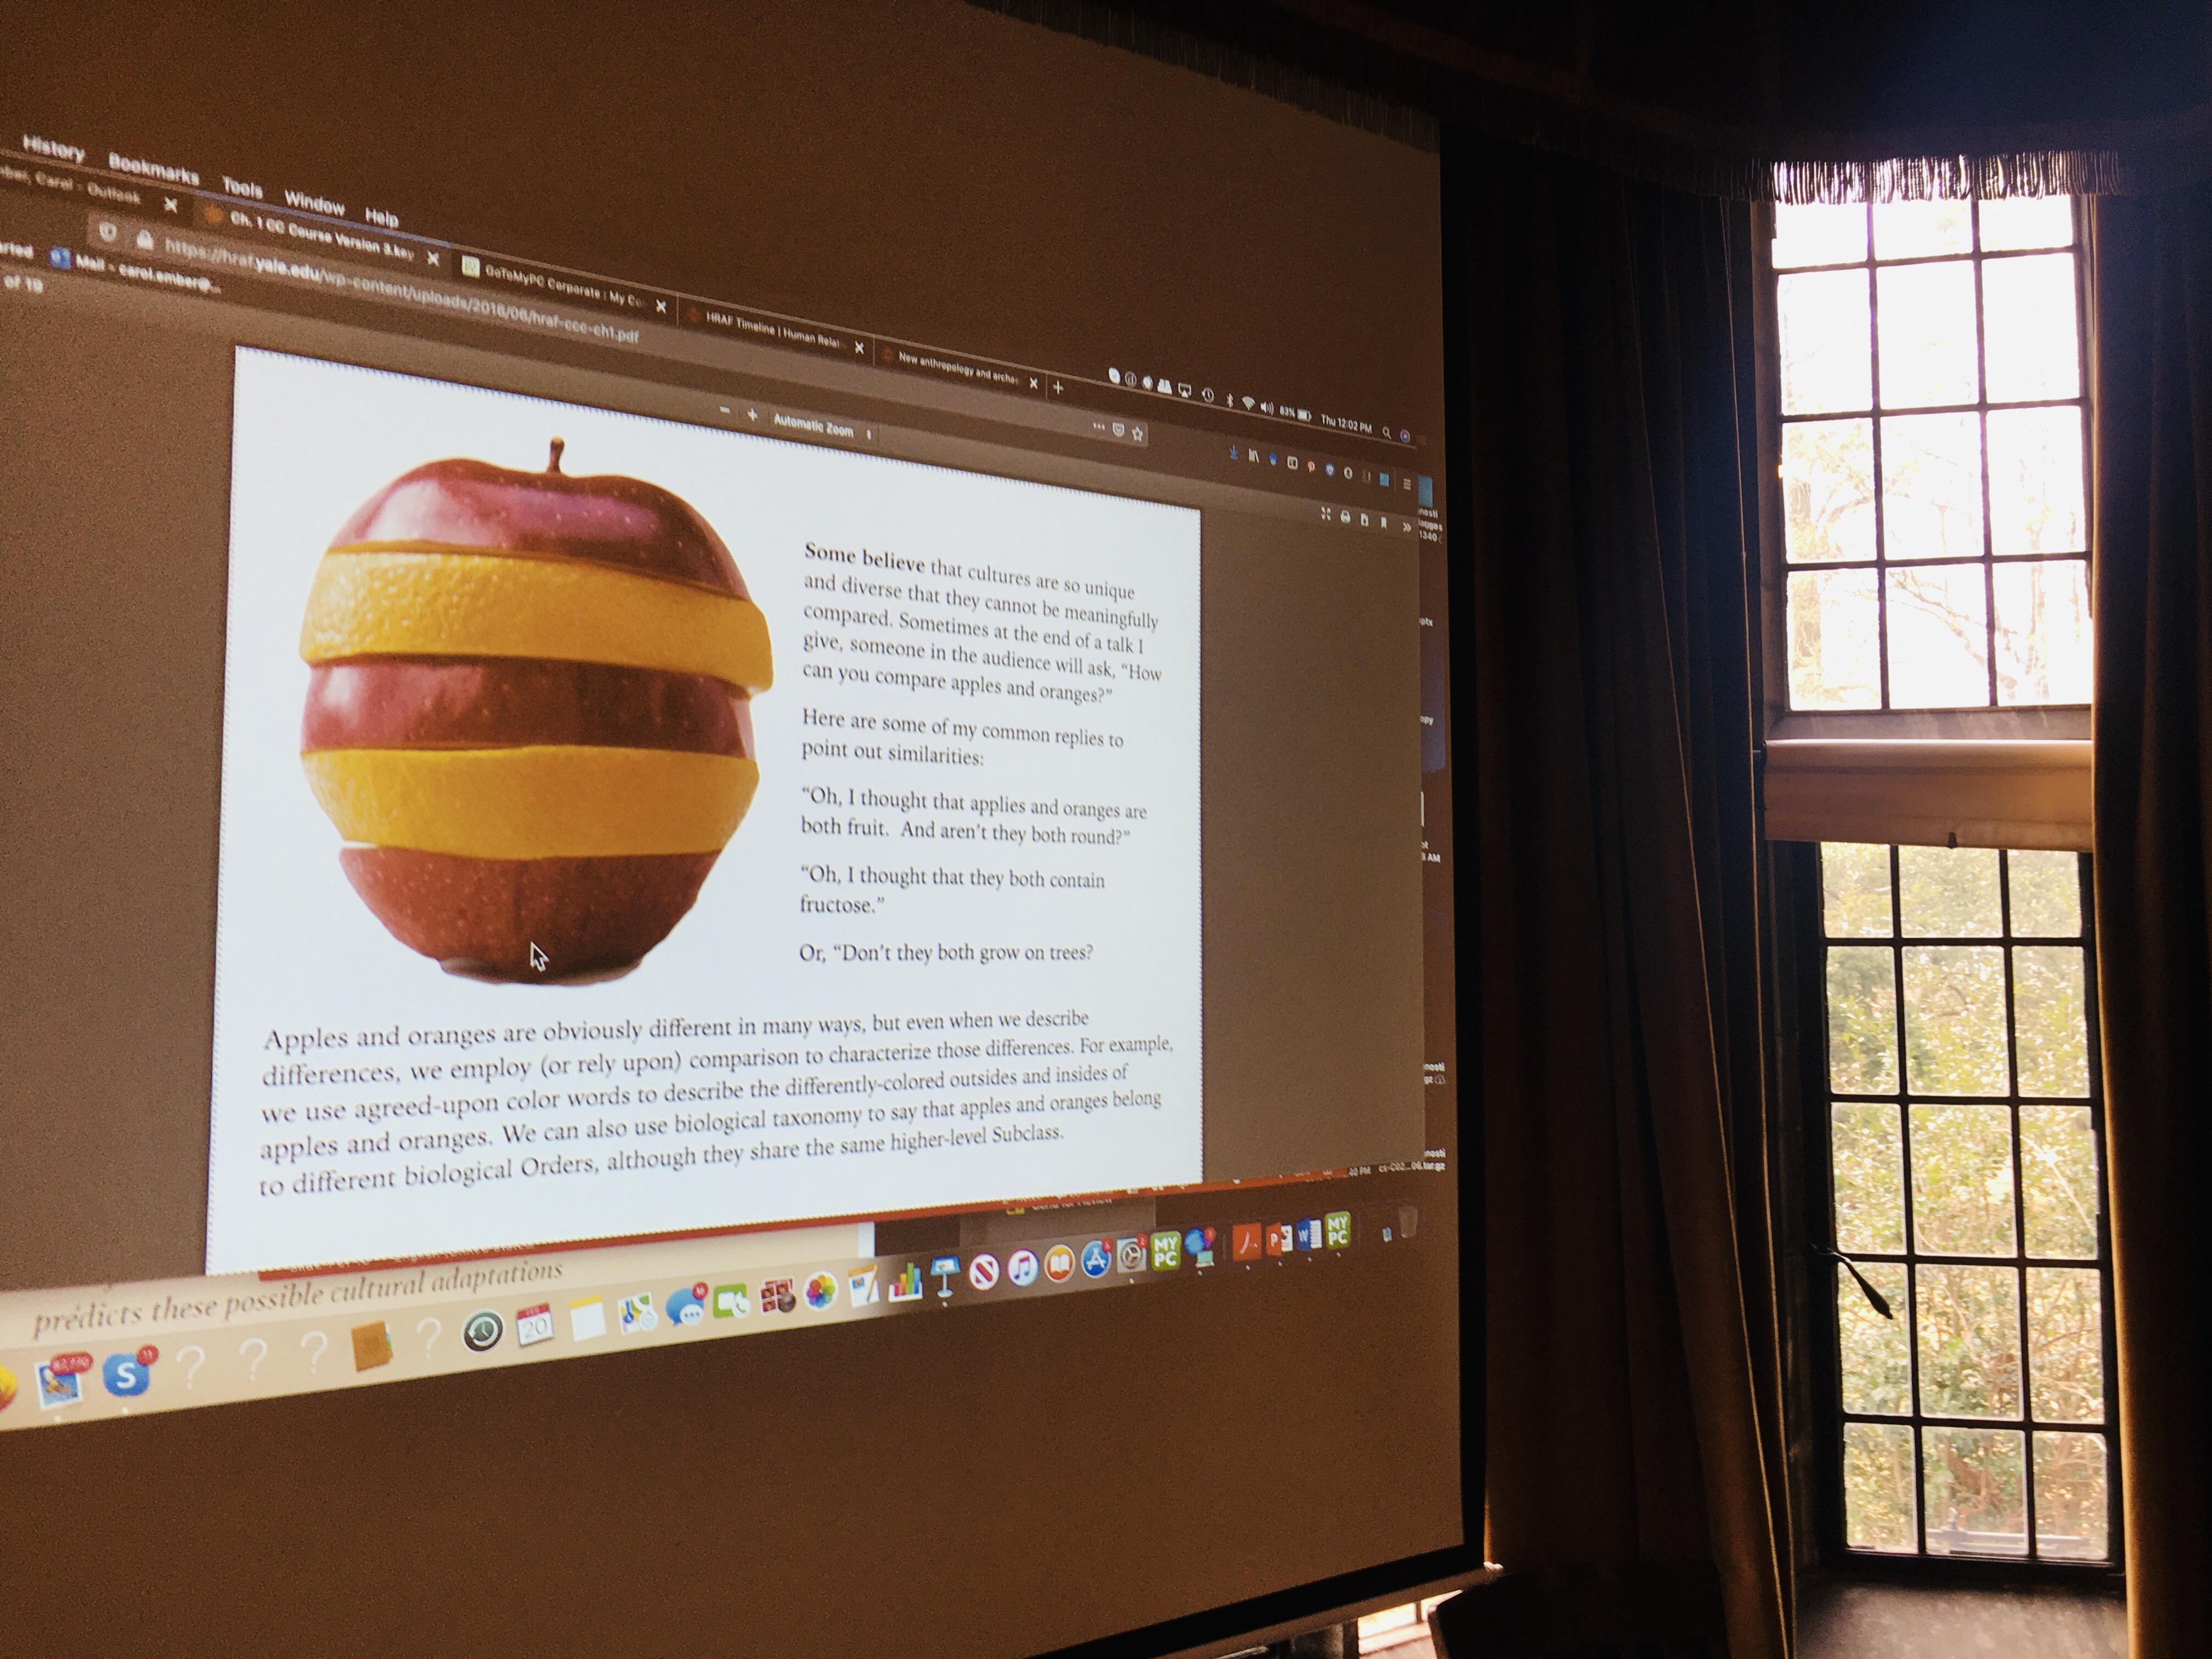 Apples and oranges presentation